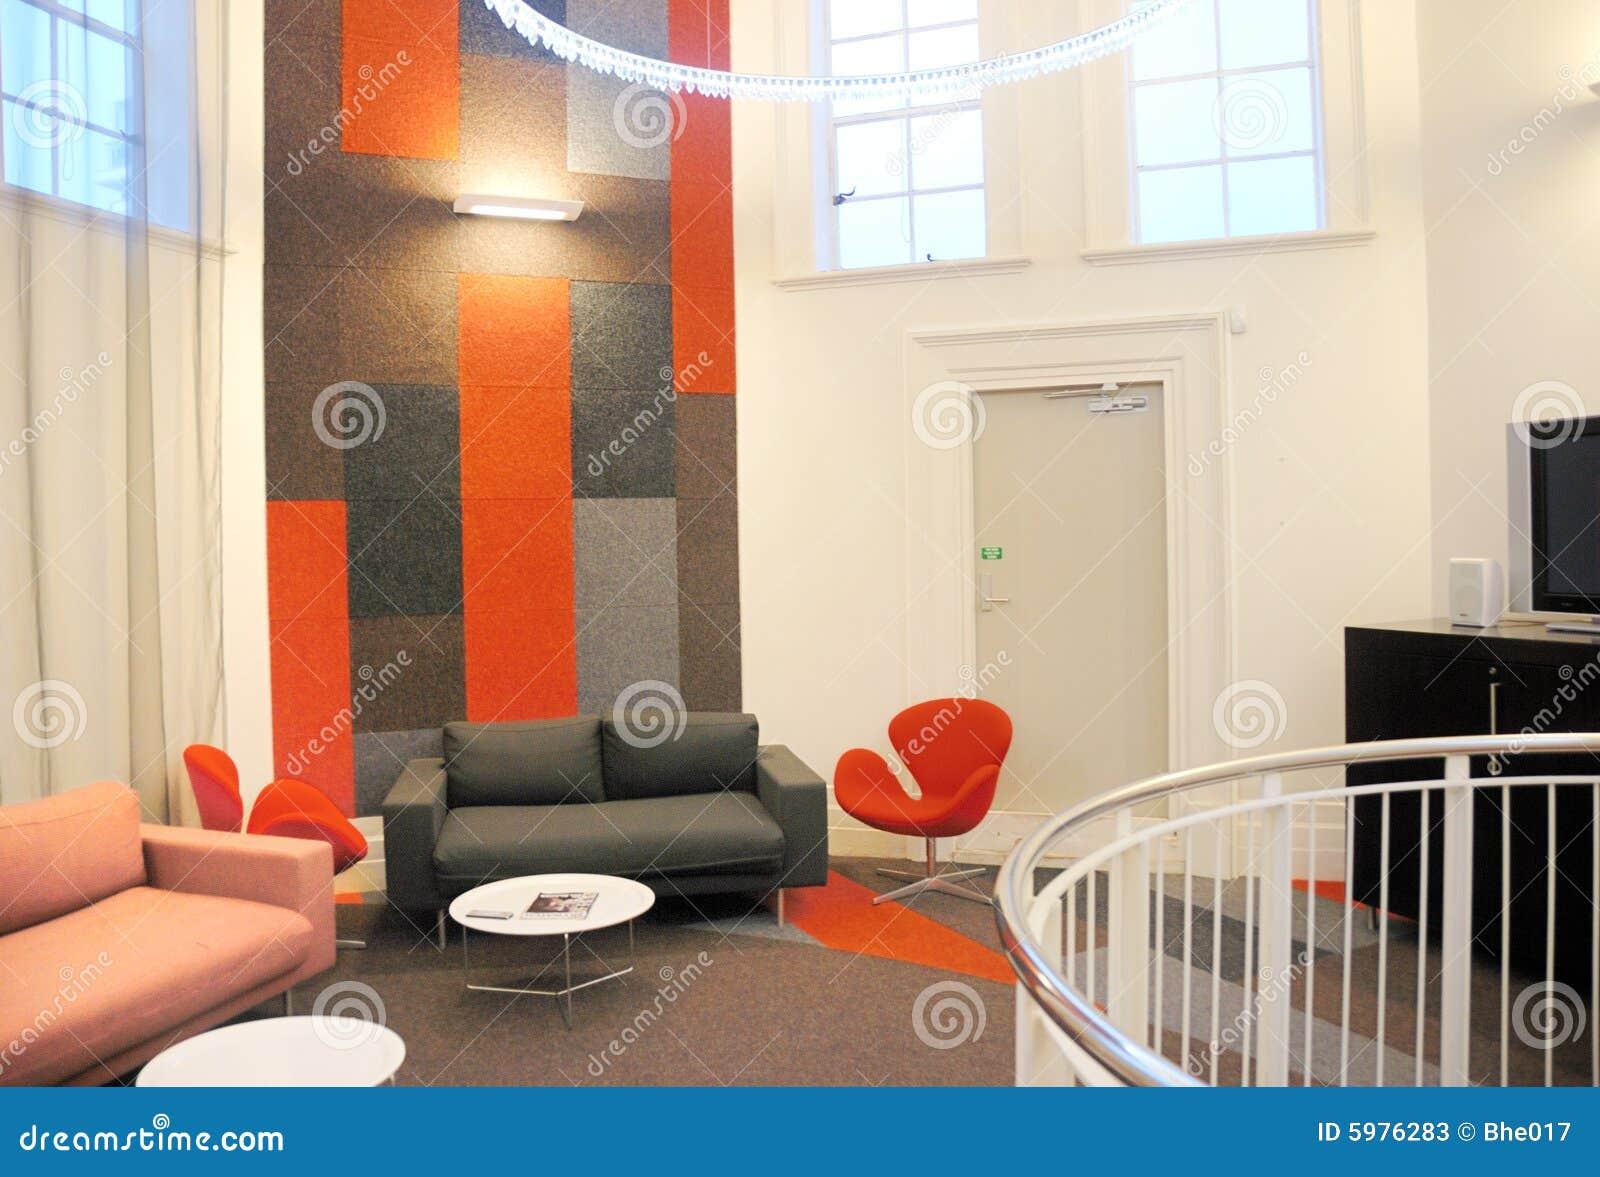 Dise o interior en oficina imagen de archivo imagen de for Diseno de interiores oficinas pequenas